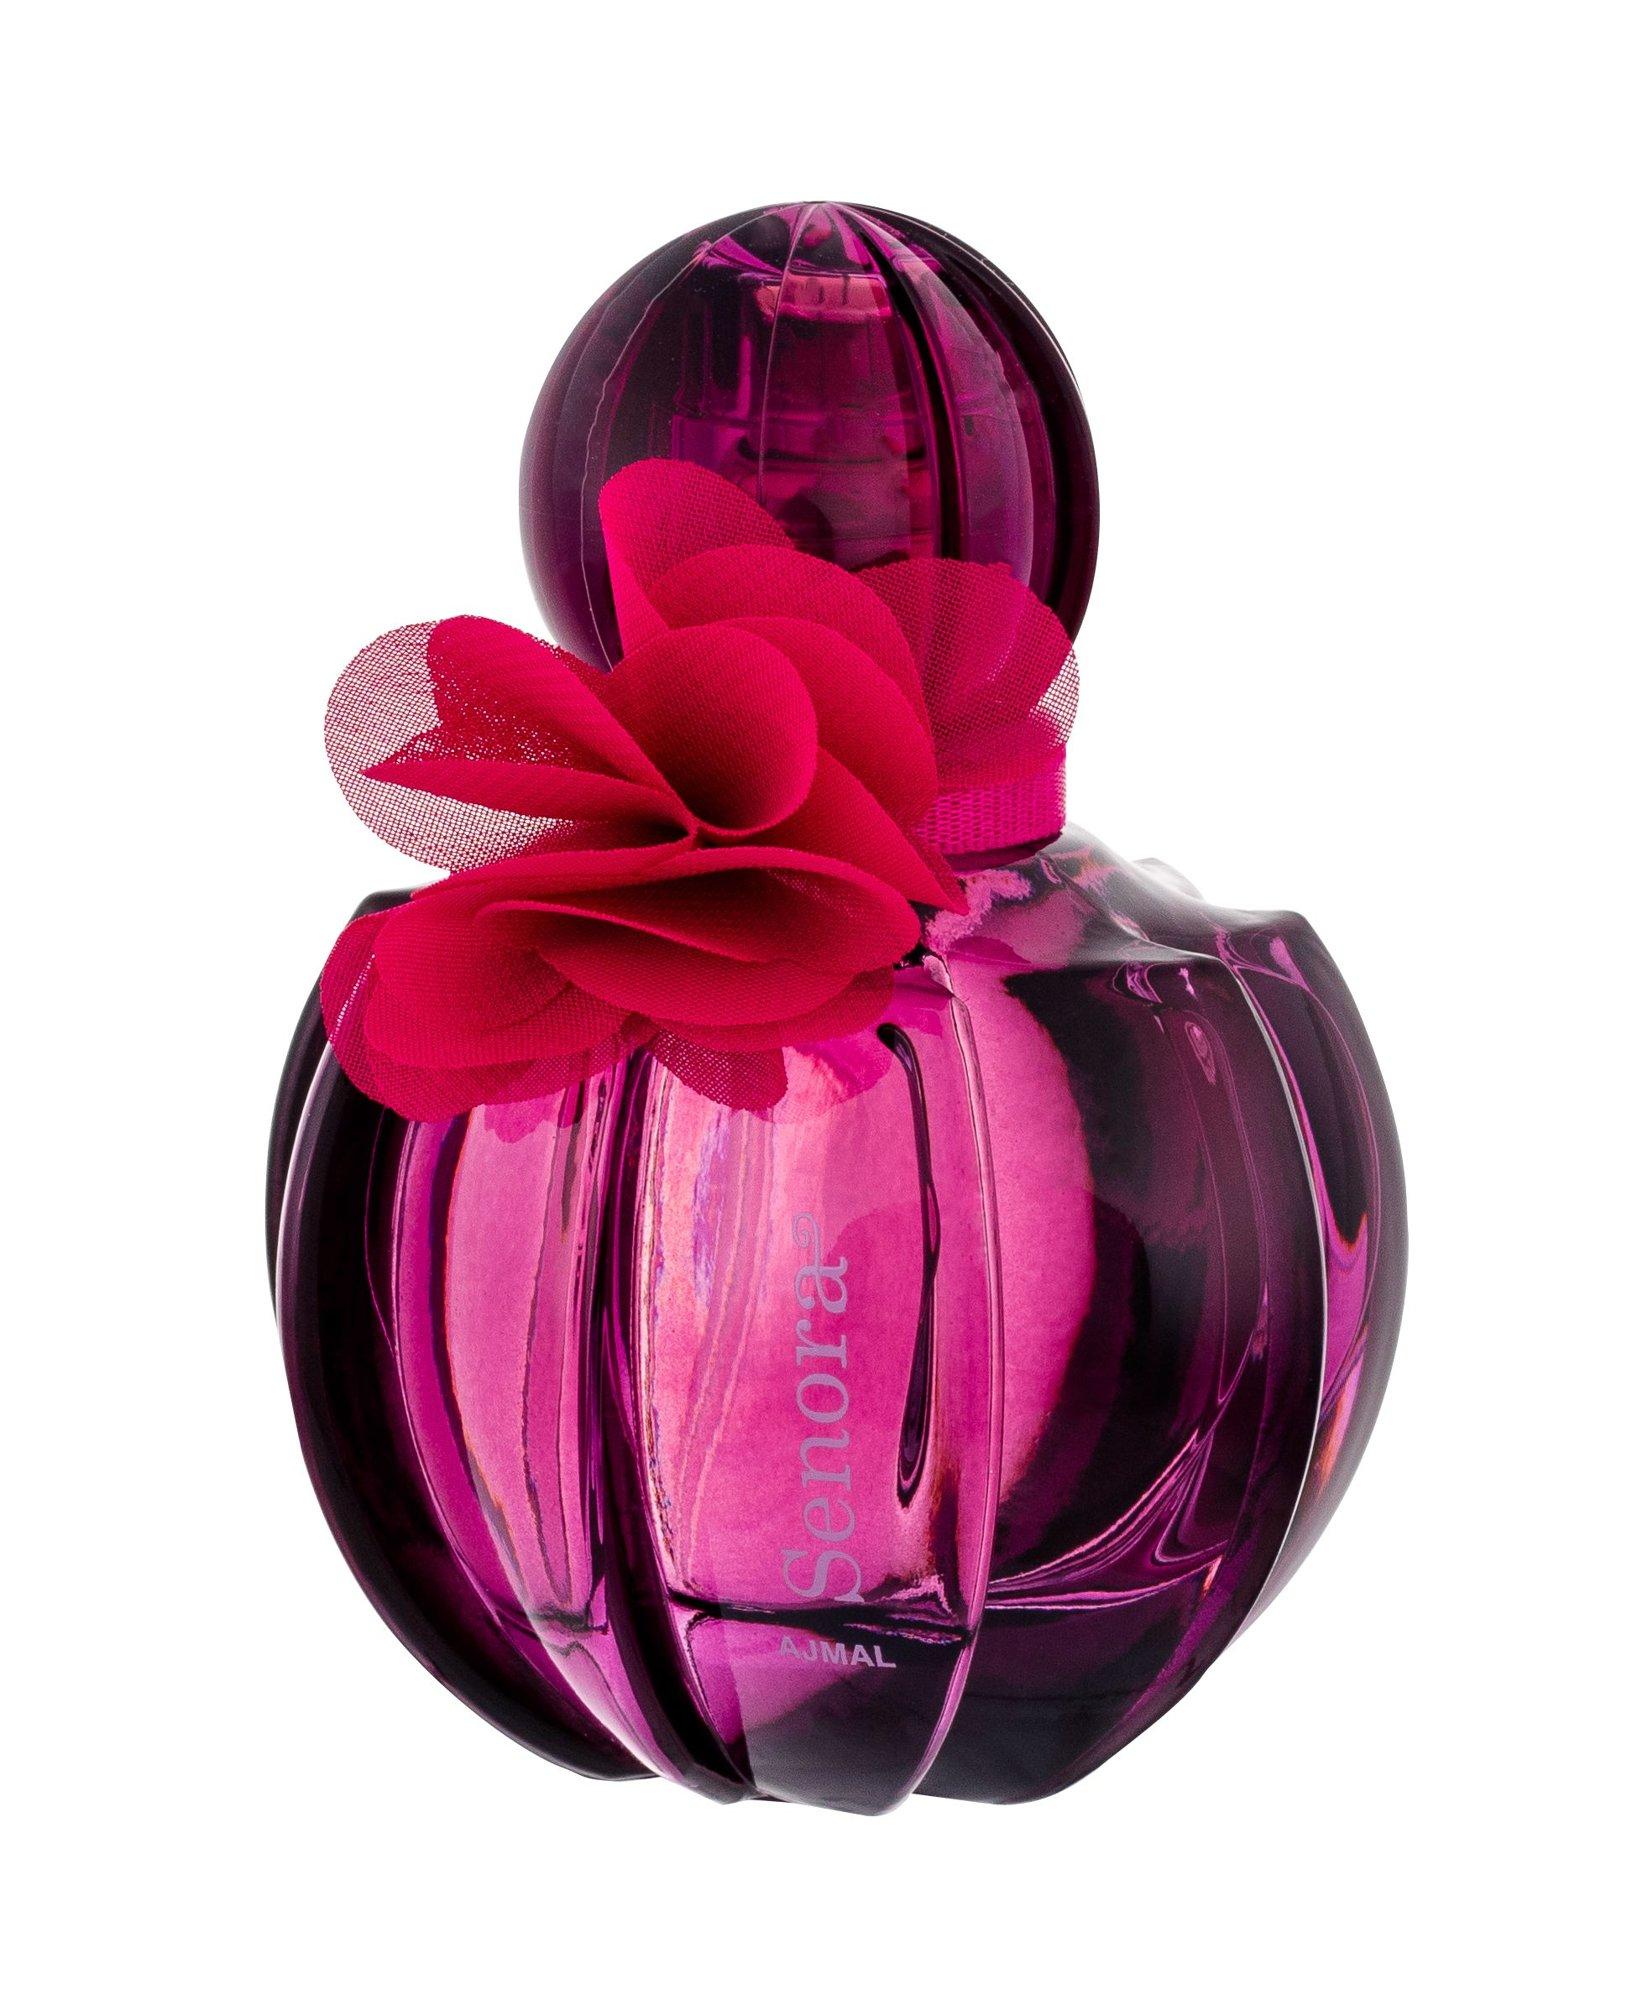 Ajmal Senora Eau de Parfum 75ml